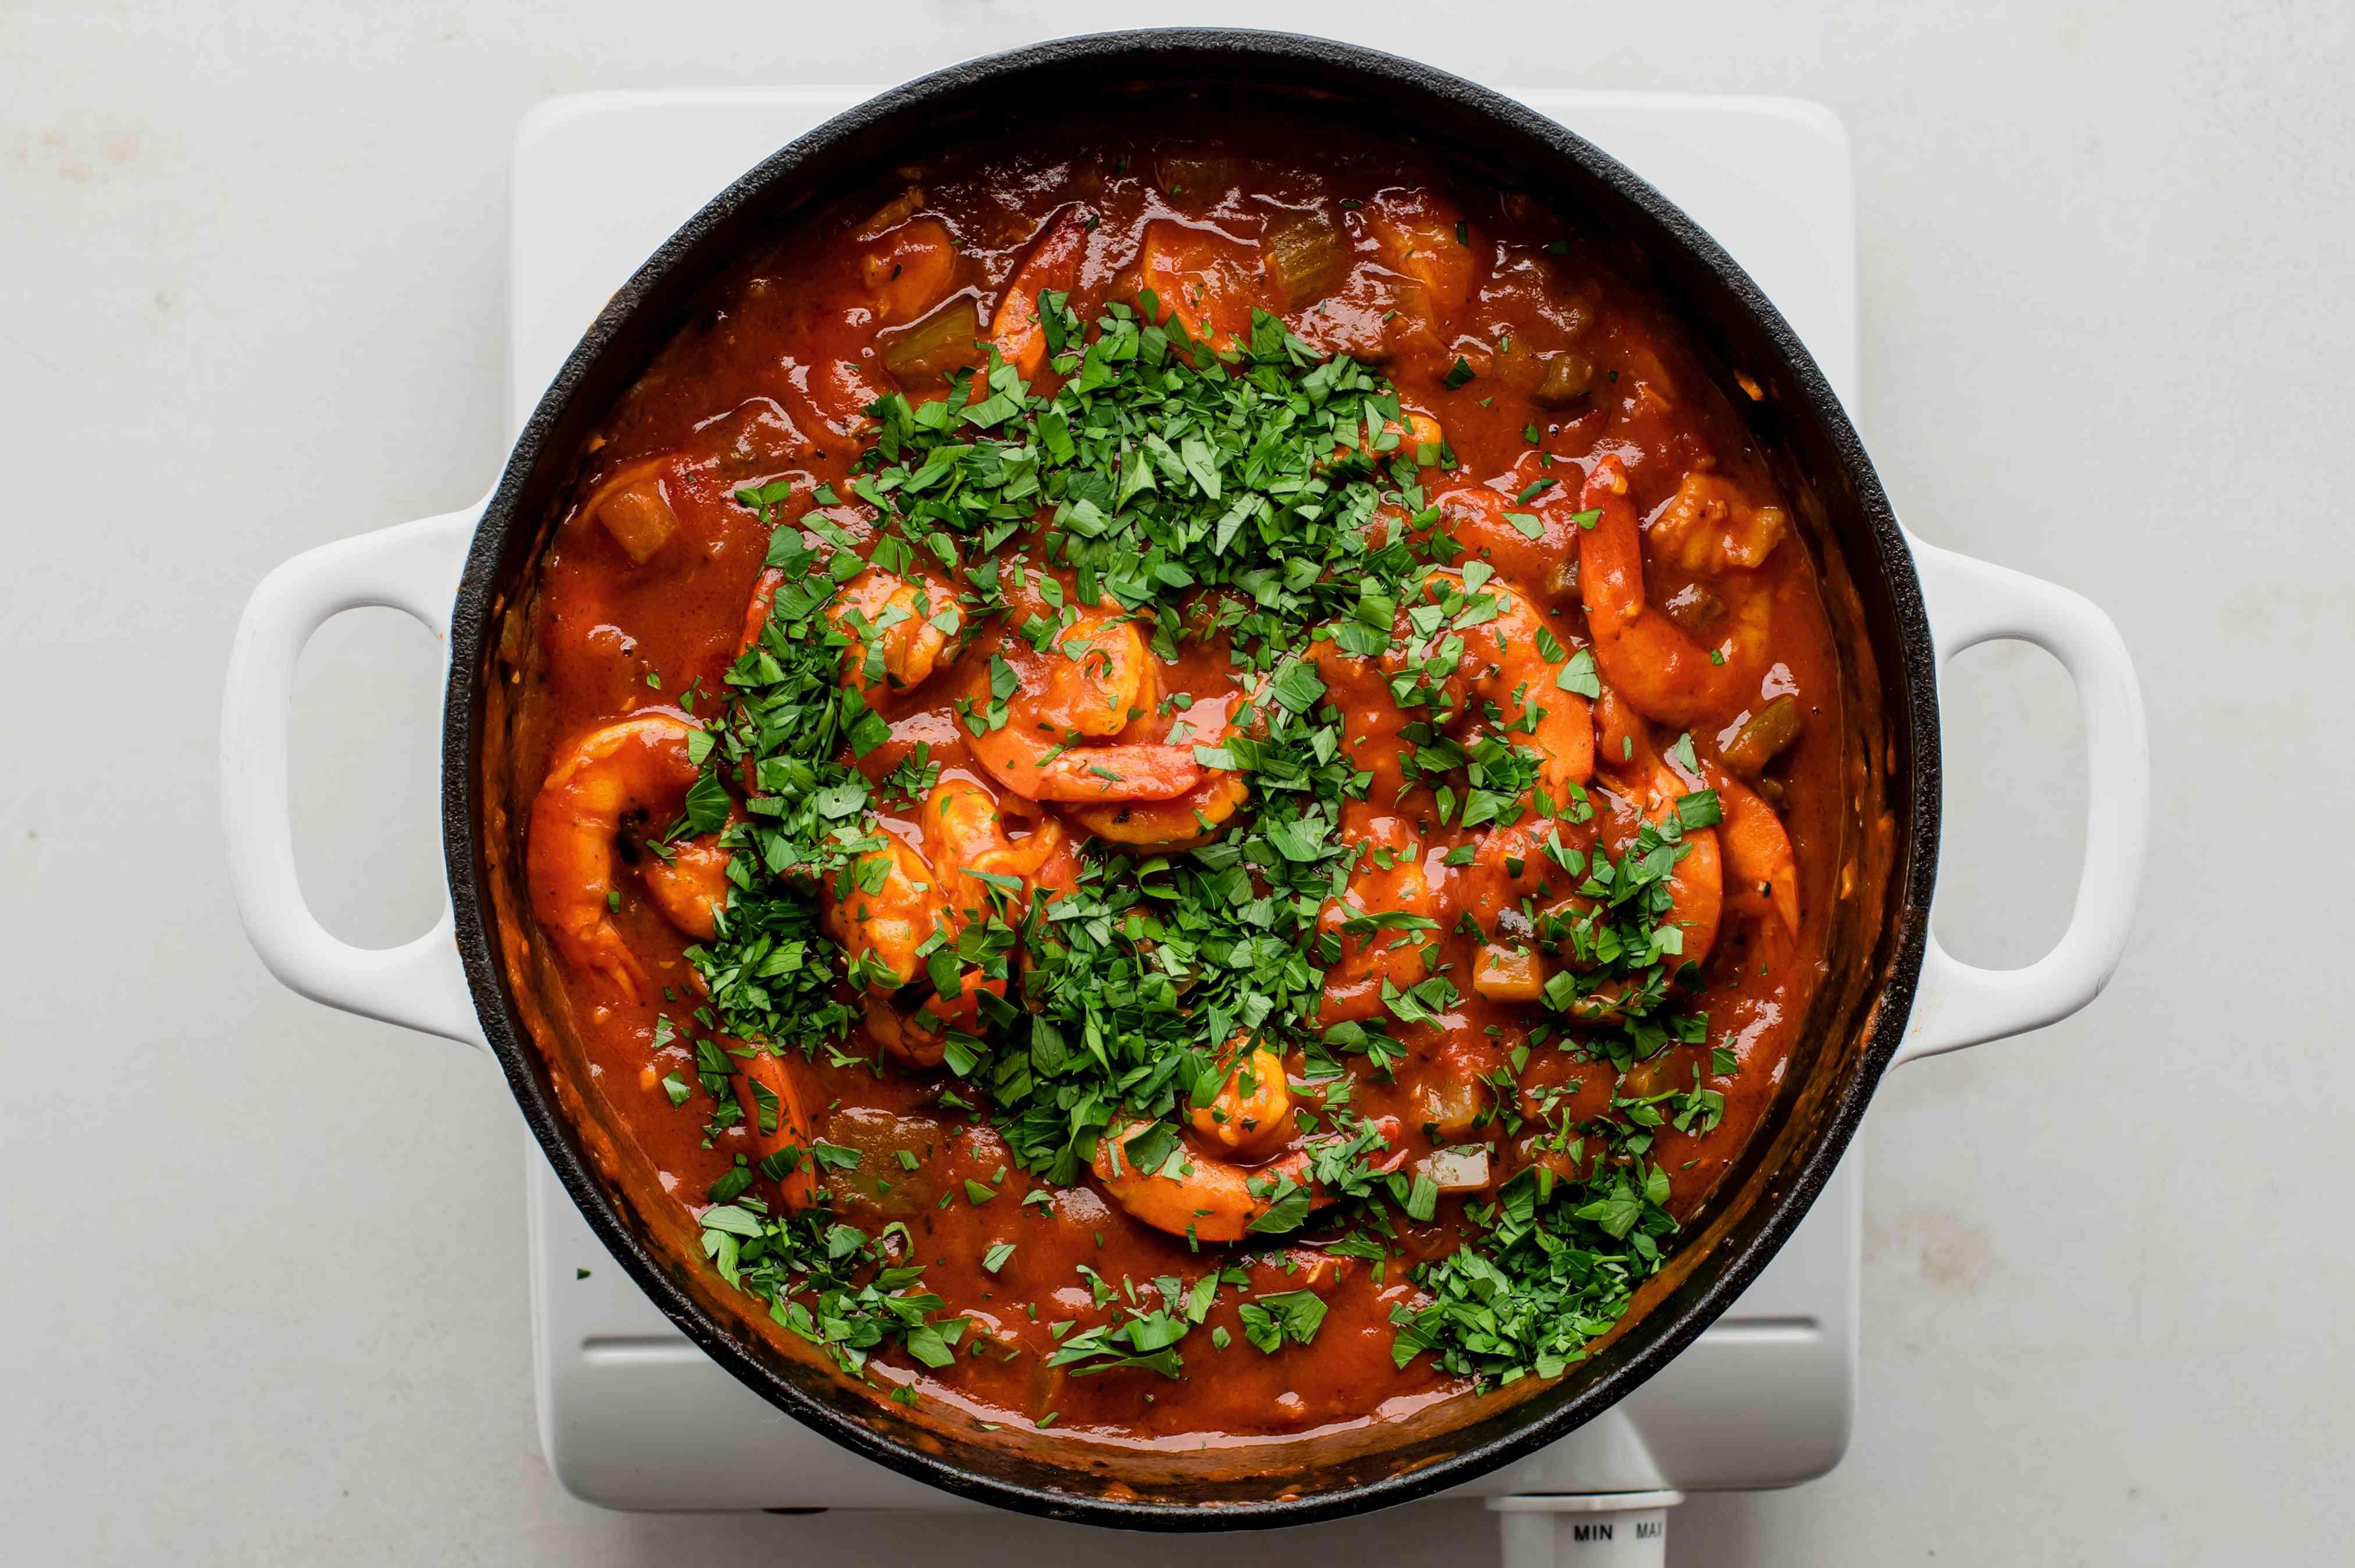 Stir in parsley